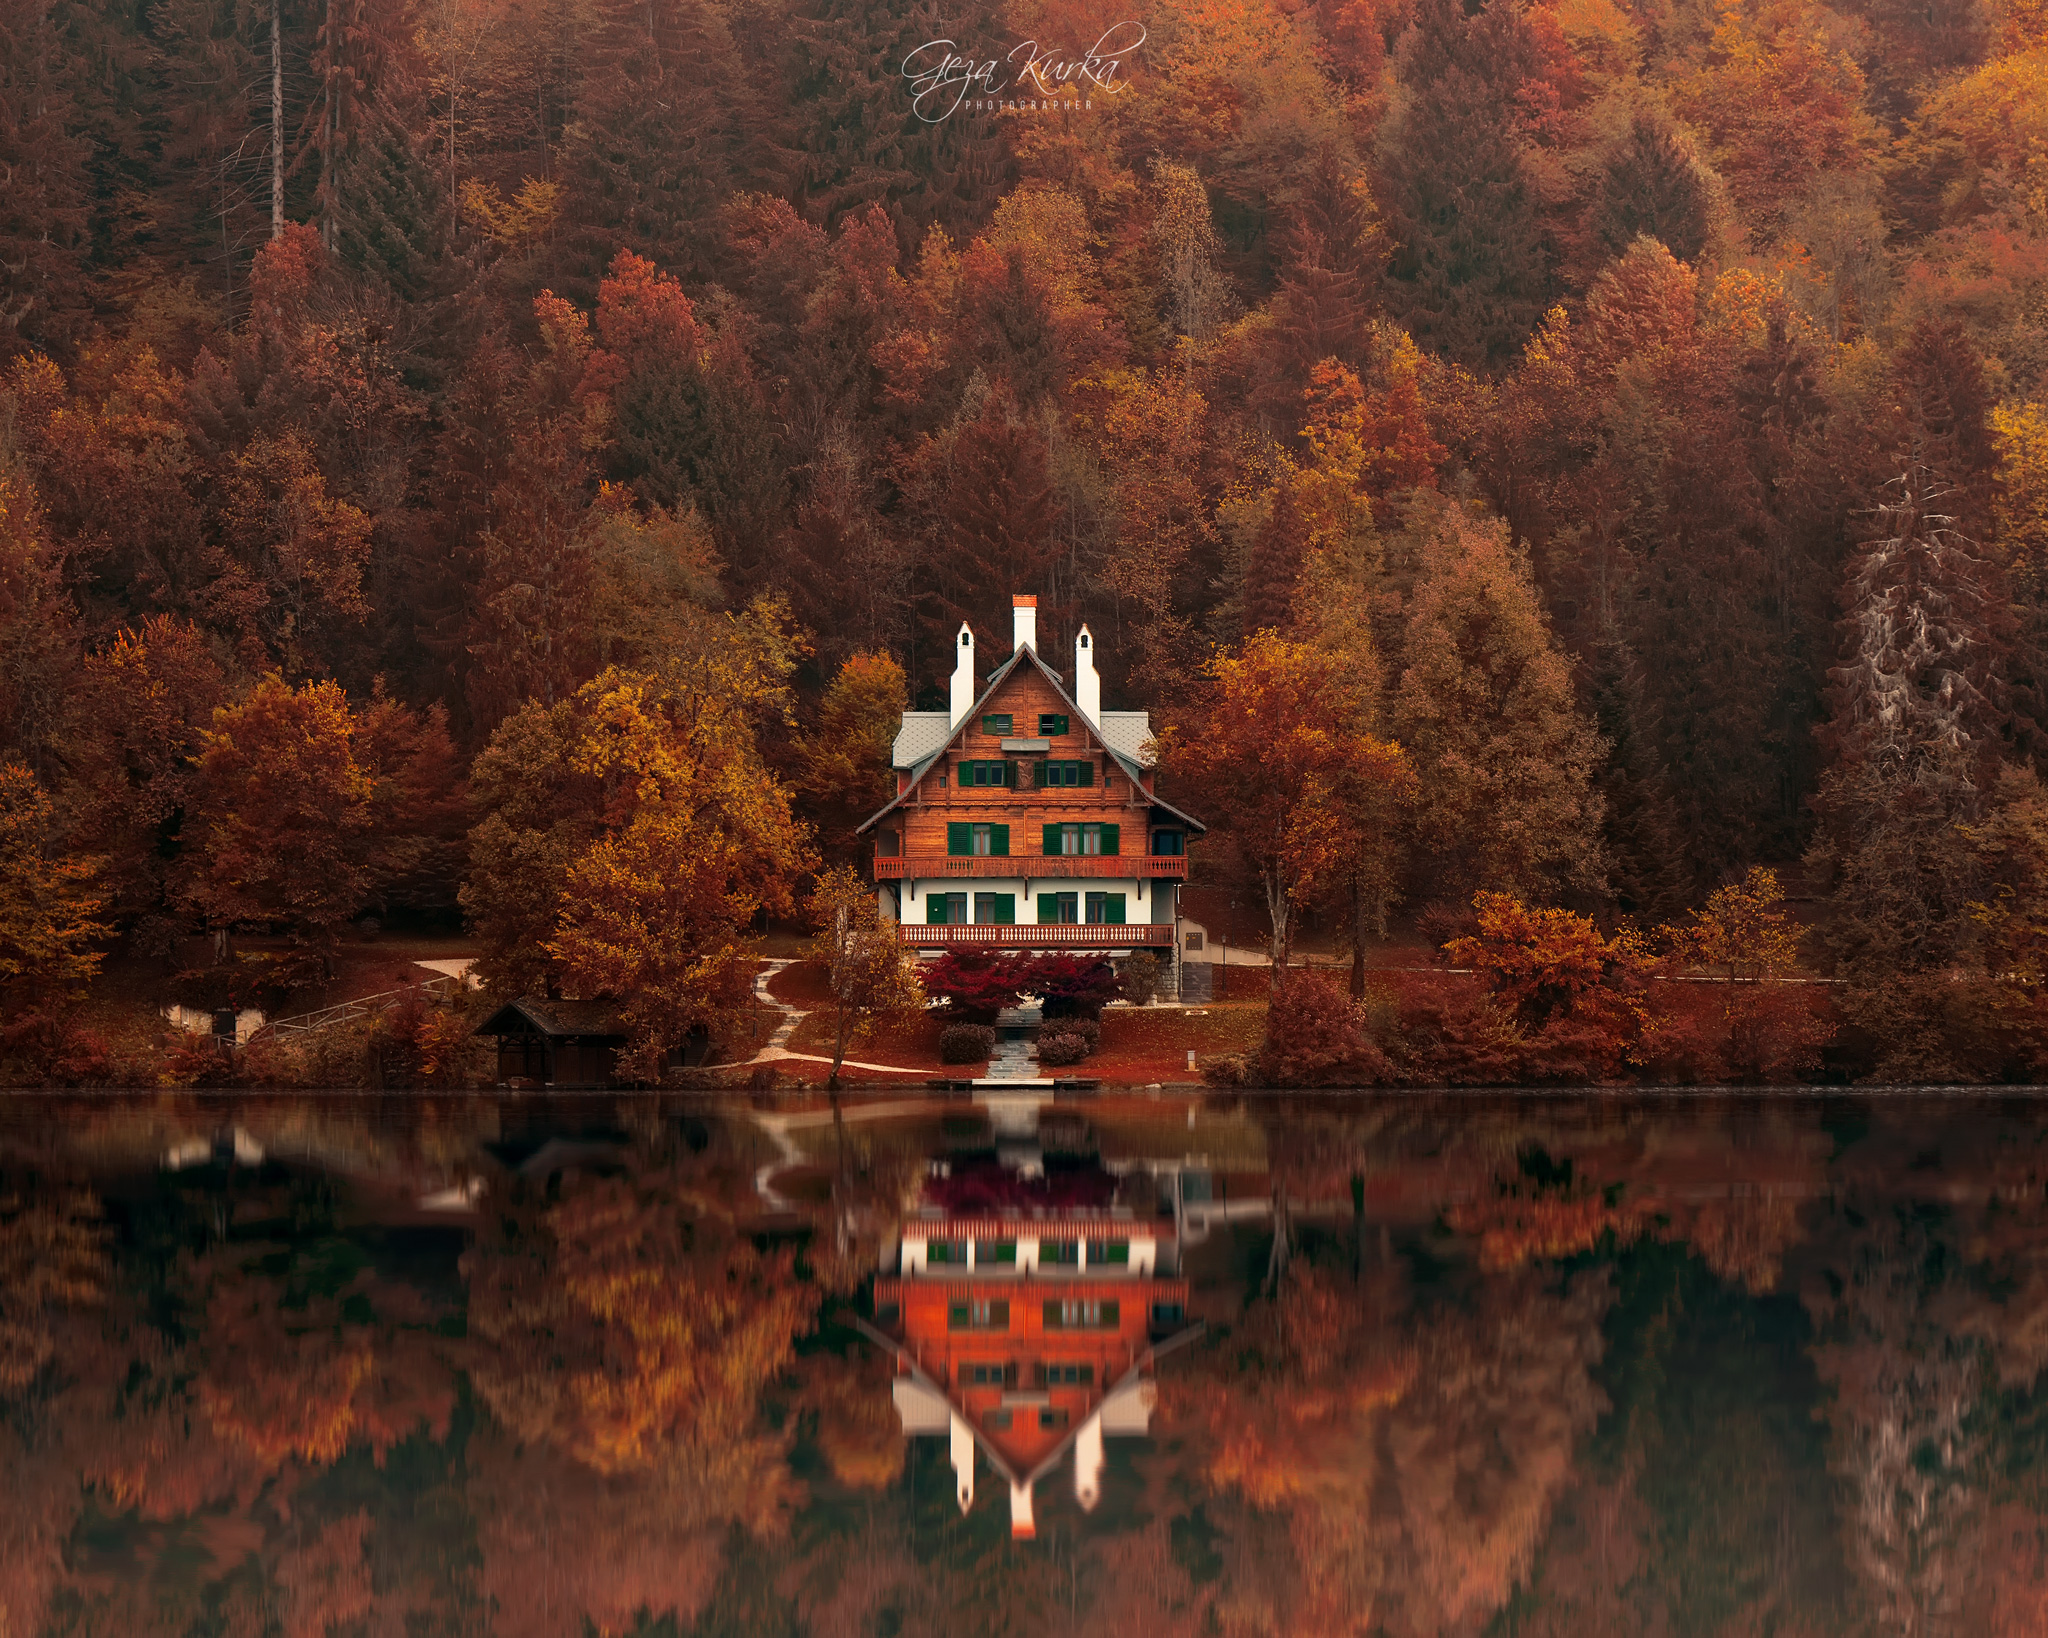 House at the lake, Slovenia